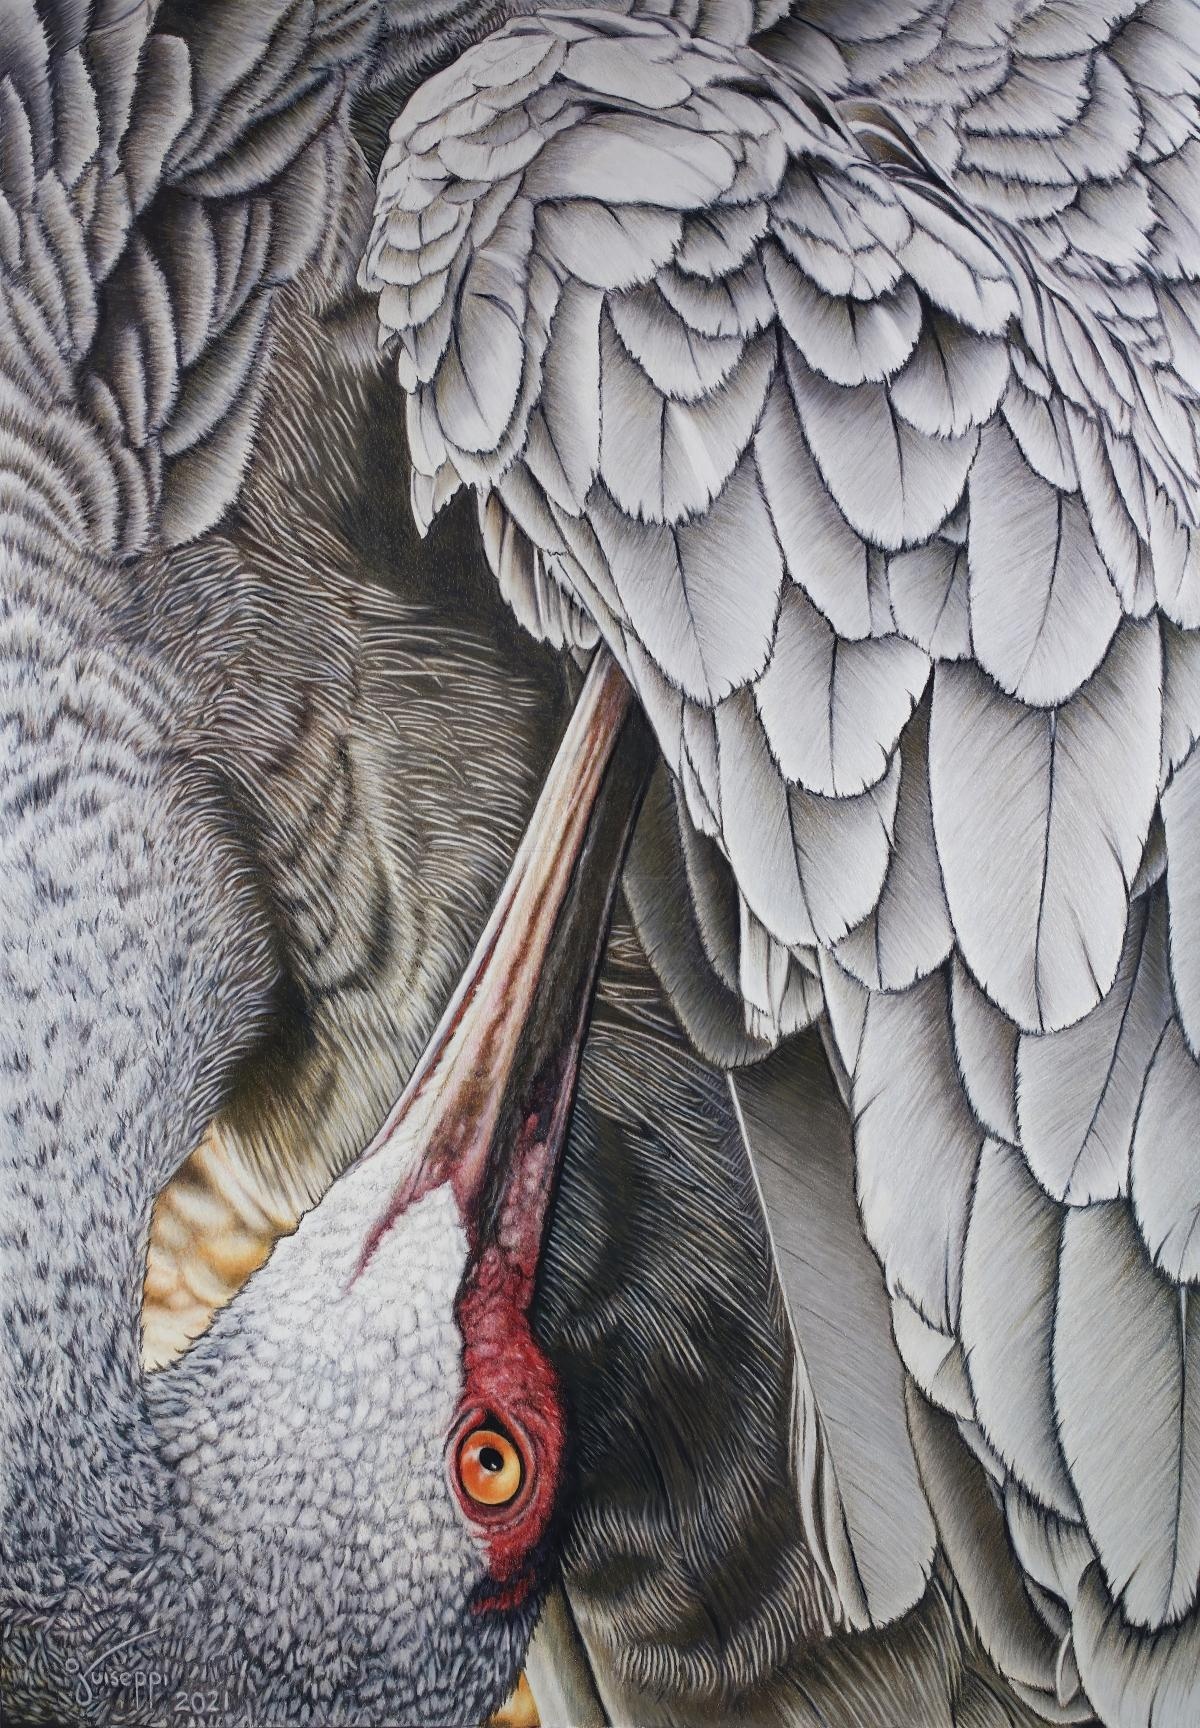 Add Artwork | Wallhanging by John Guiseppi | Artists for Conservation